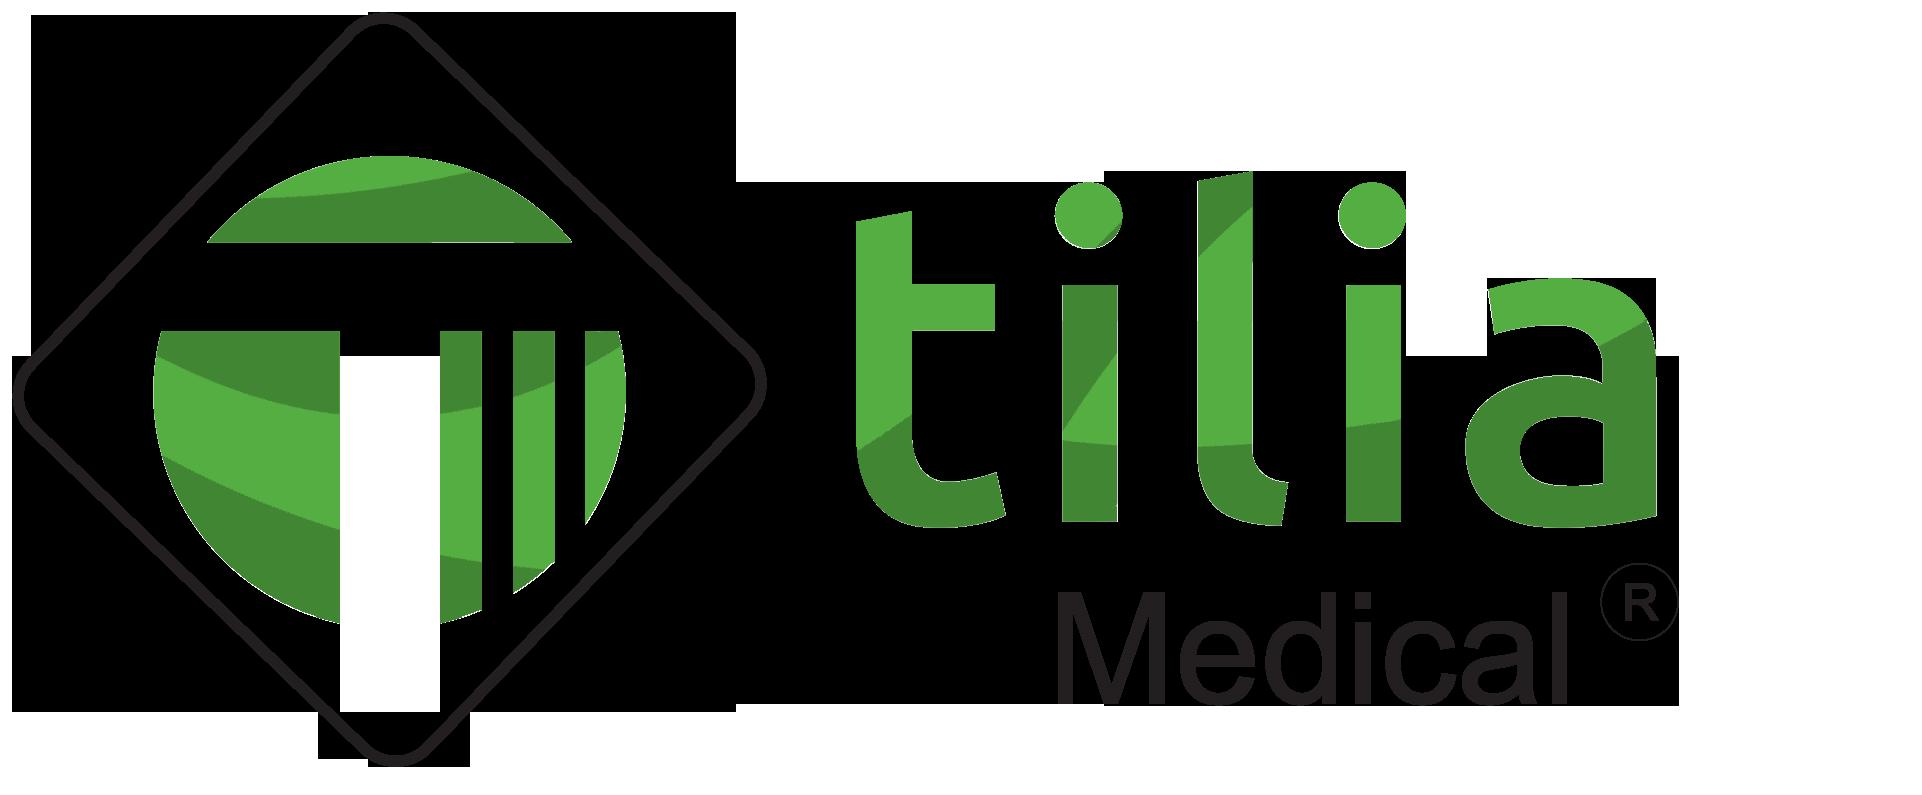 Tilia Medikal Sağlık Tekstil Gıda İnşaat İthalat İhracat Sanayi ve Ticaret Limited Şirketi, Tilia Medical